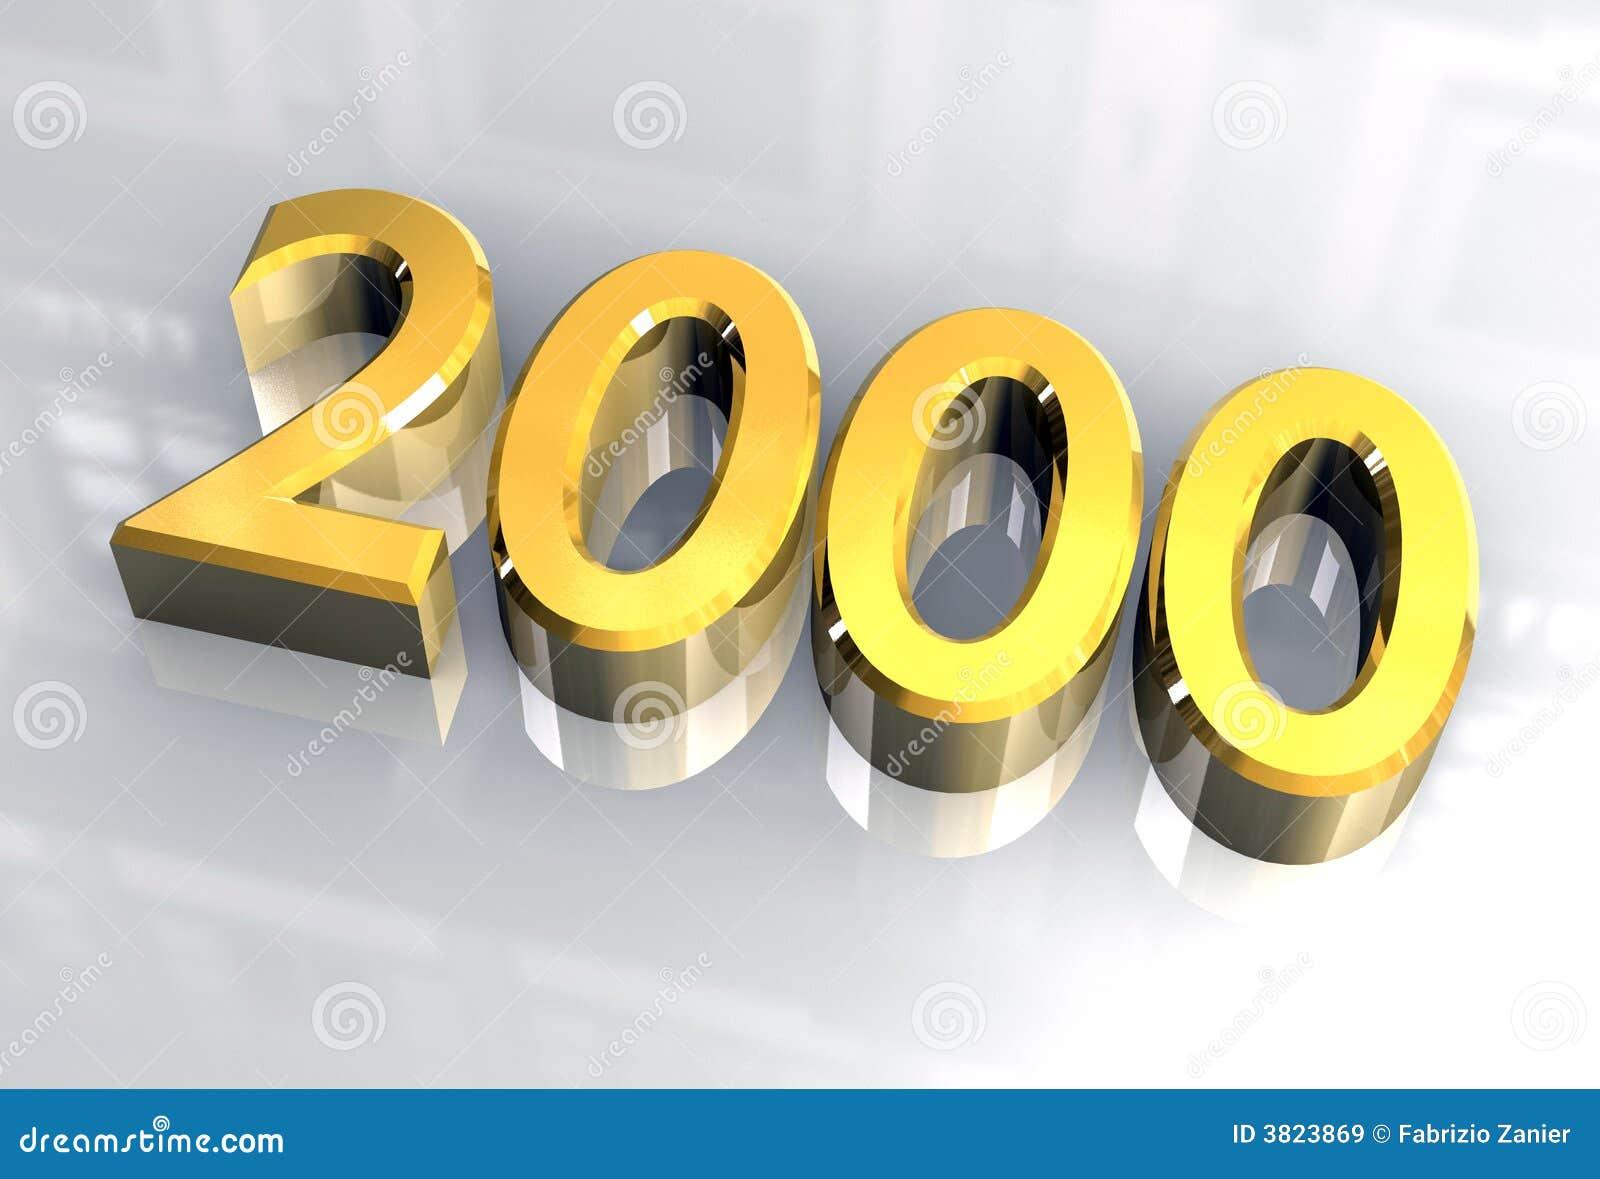 new year 2000 in gold 3d stock illustration illustration of background 3823869. Black Bedroom Furniture Sets. Home Design Ideas